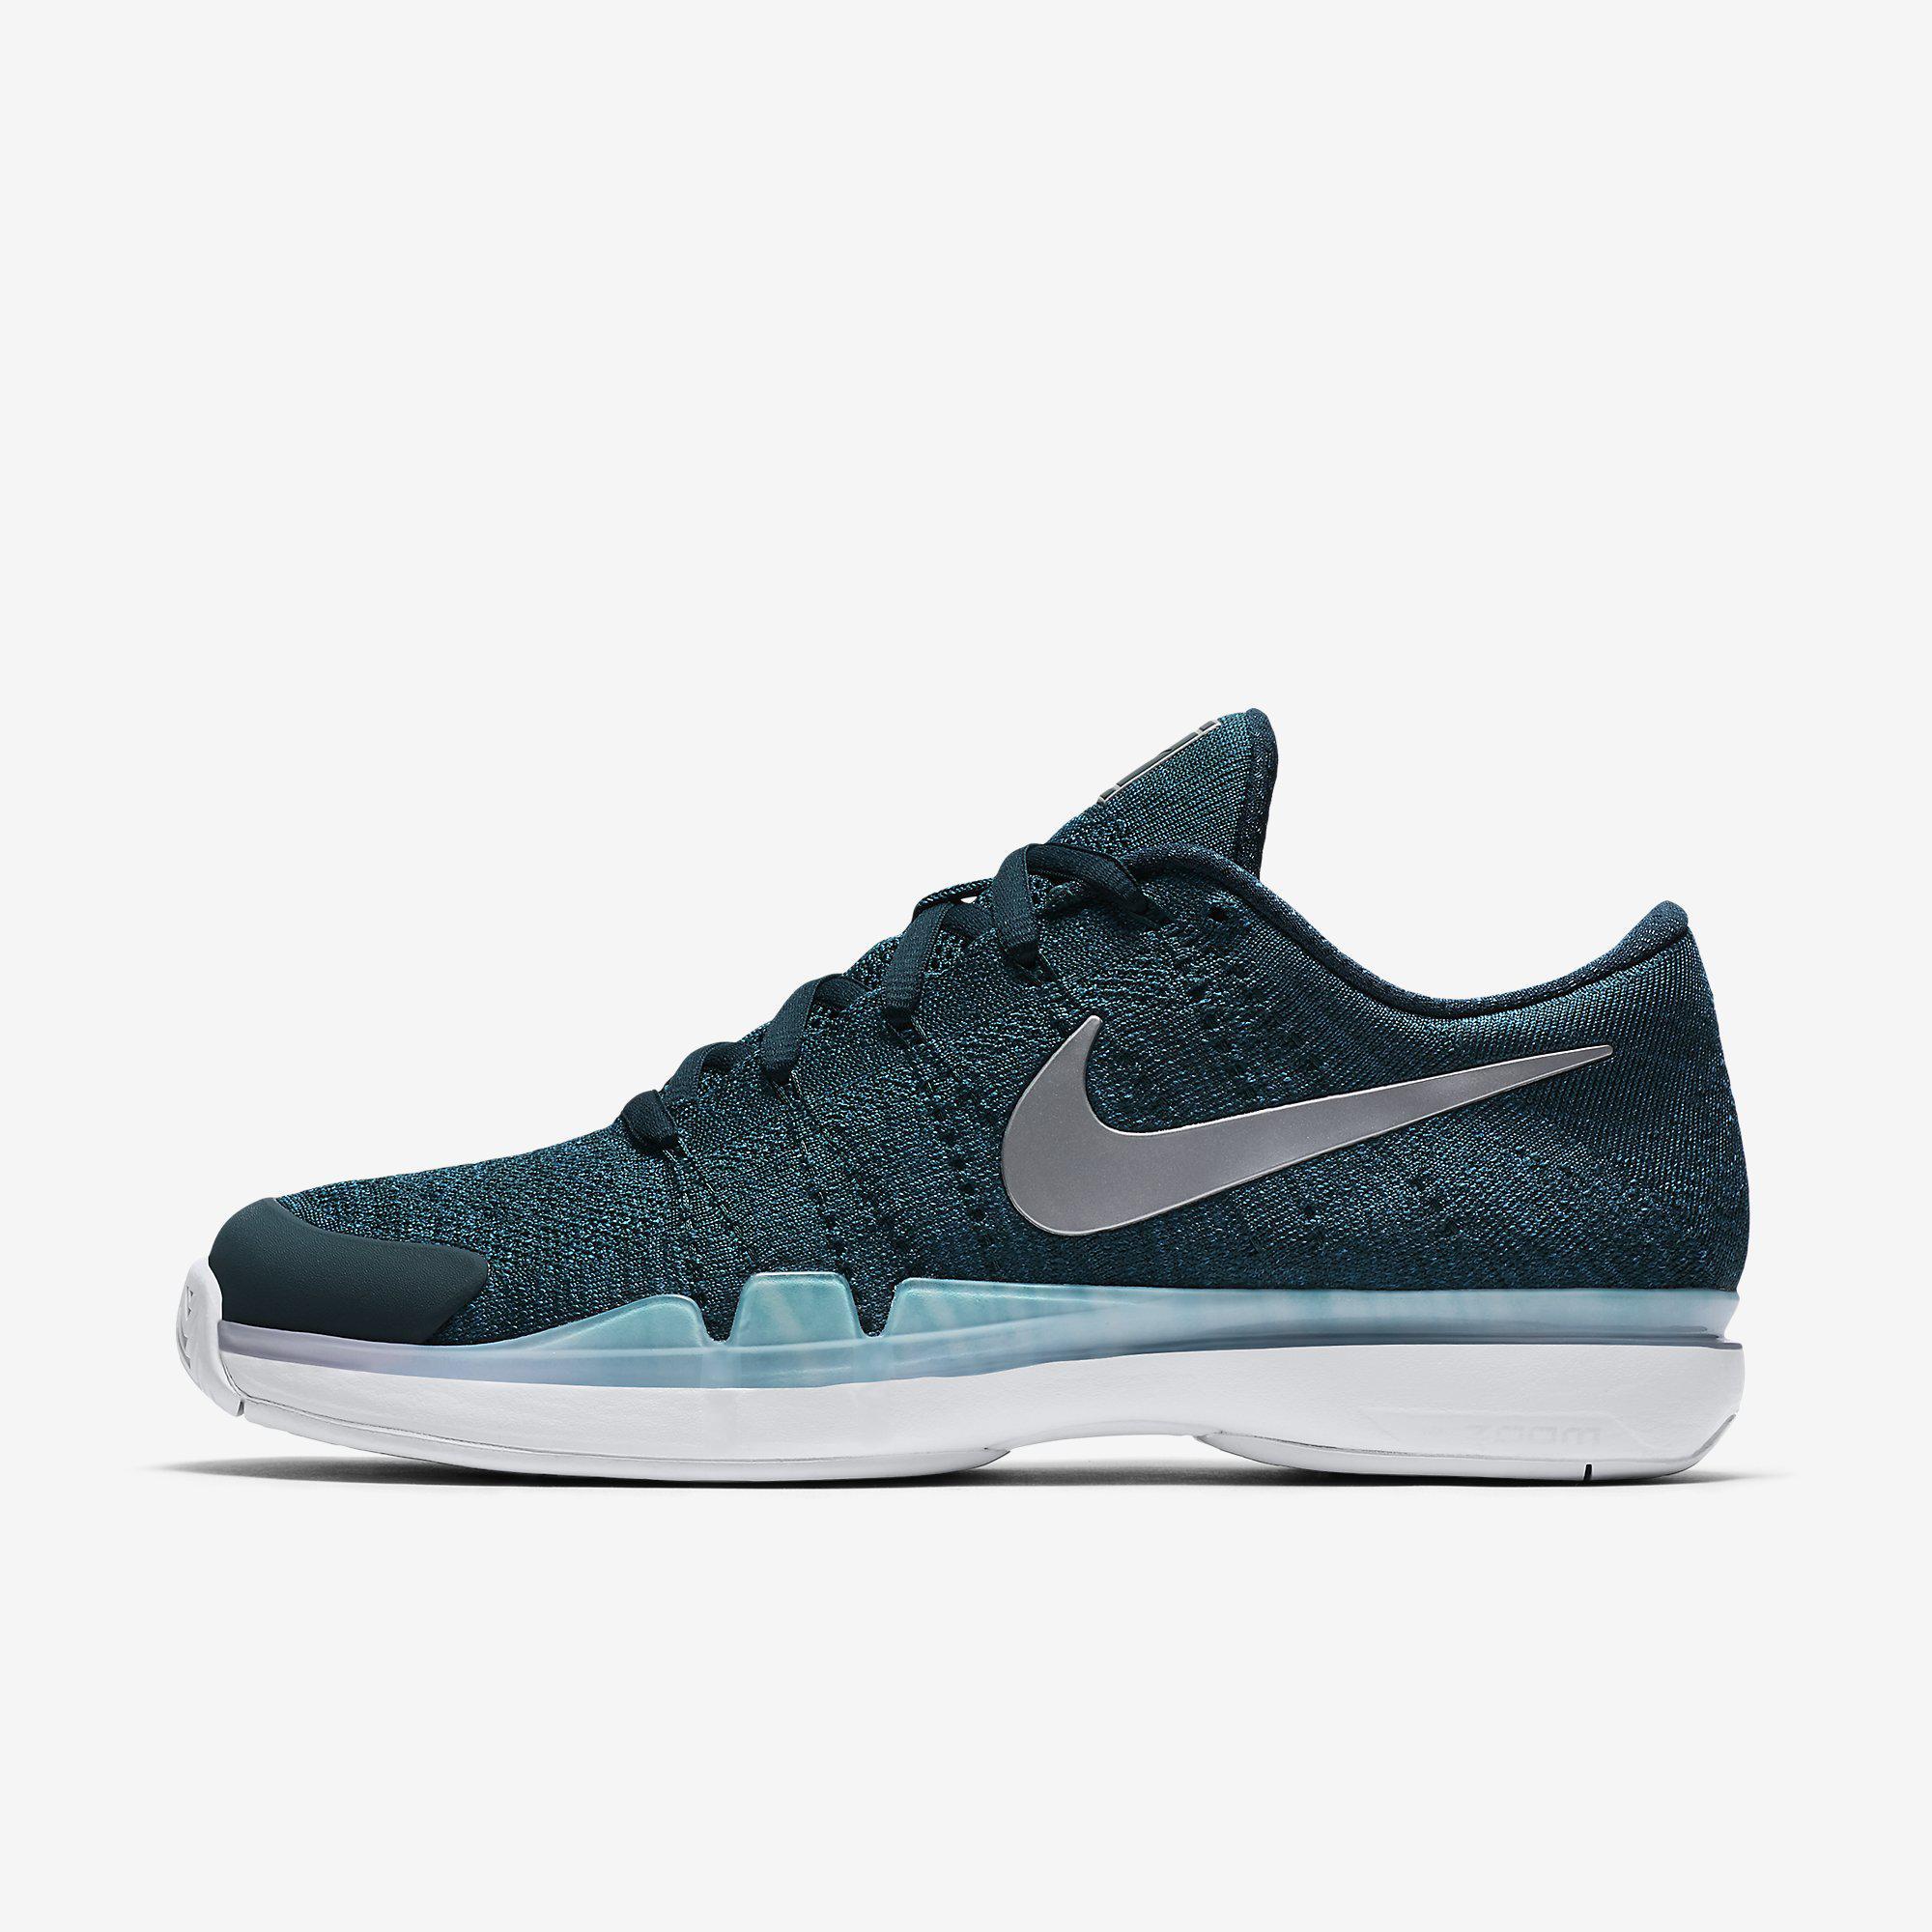 e249a83a1262 Nike Mens Zoom Vapor 9.5 Flyknit Tennis Shoes - Dark Atomic Teal -  Tennisnuts.com